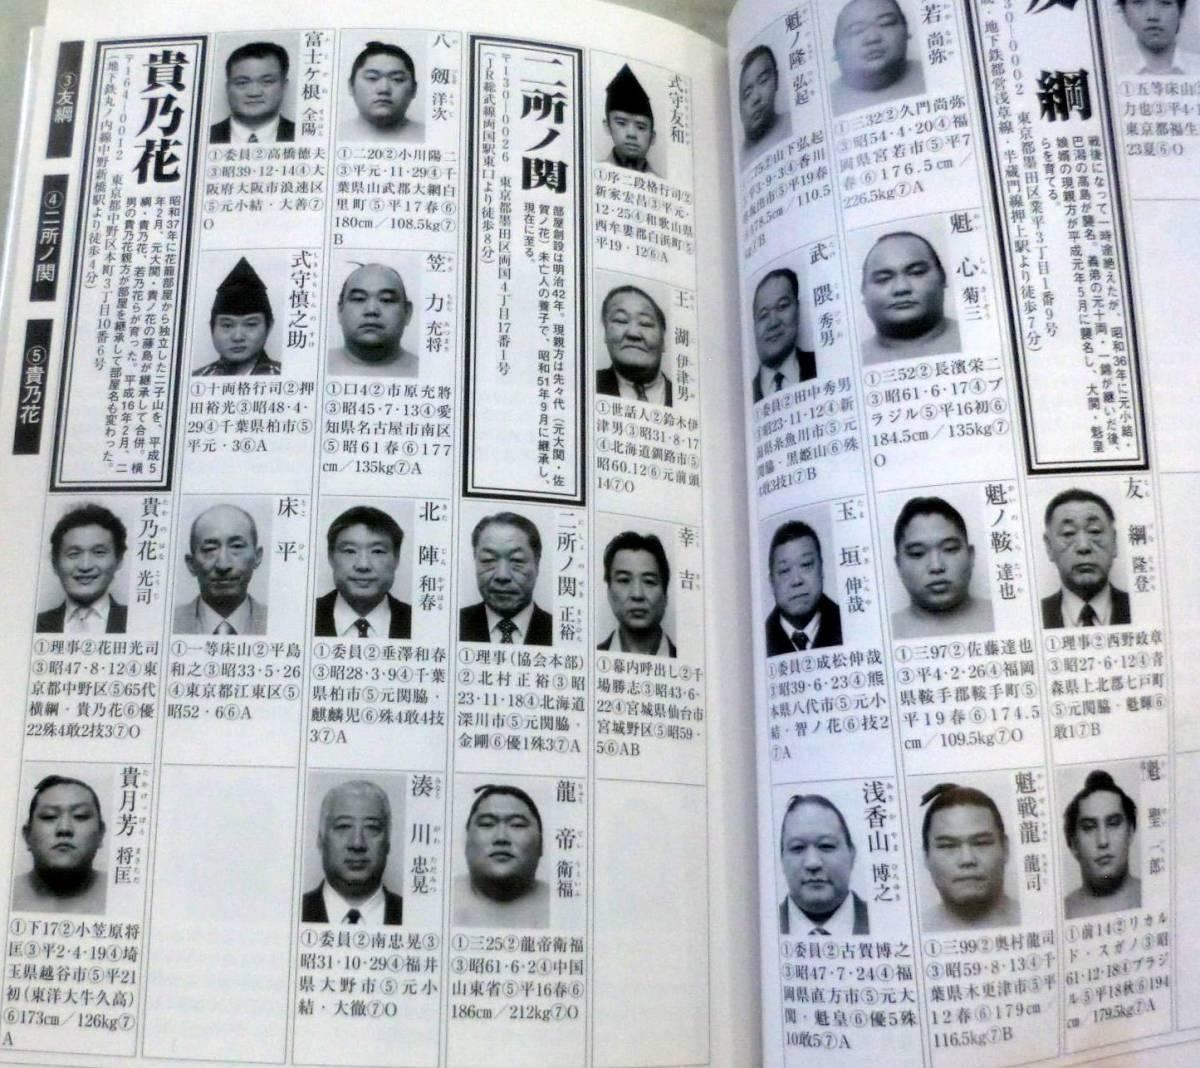 ヤフオク! - 【相撲雑誌】平成24年度大相撲力士名鑑 「相撲...